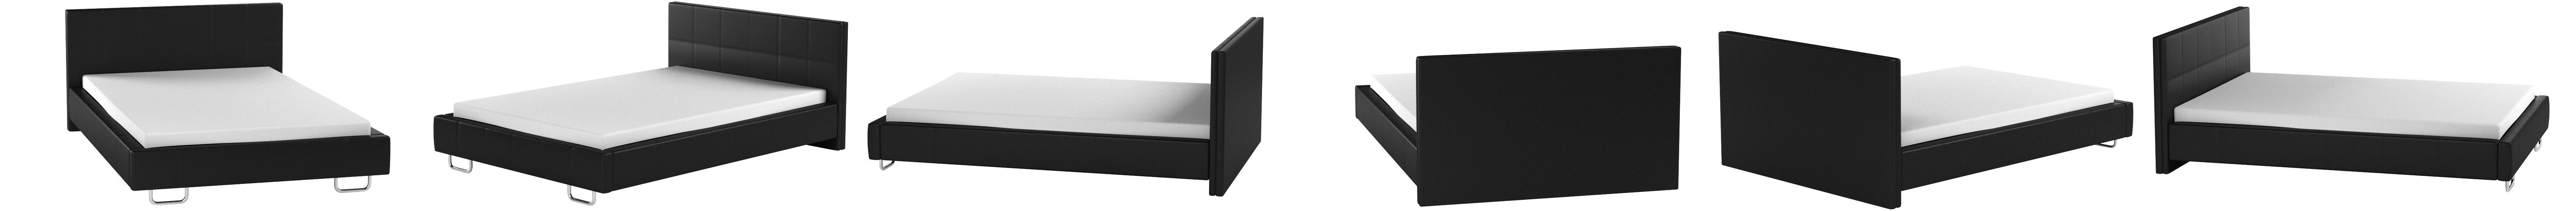 muebles bonitos Cama de Matrimonio Moderna Sofia con somier de láminas para colchón de 135x190cm Negro diseño Italiano Elegante